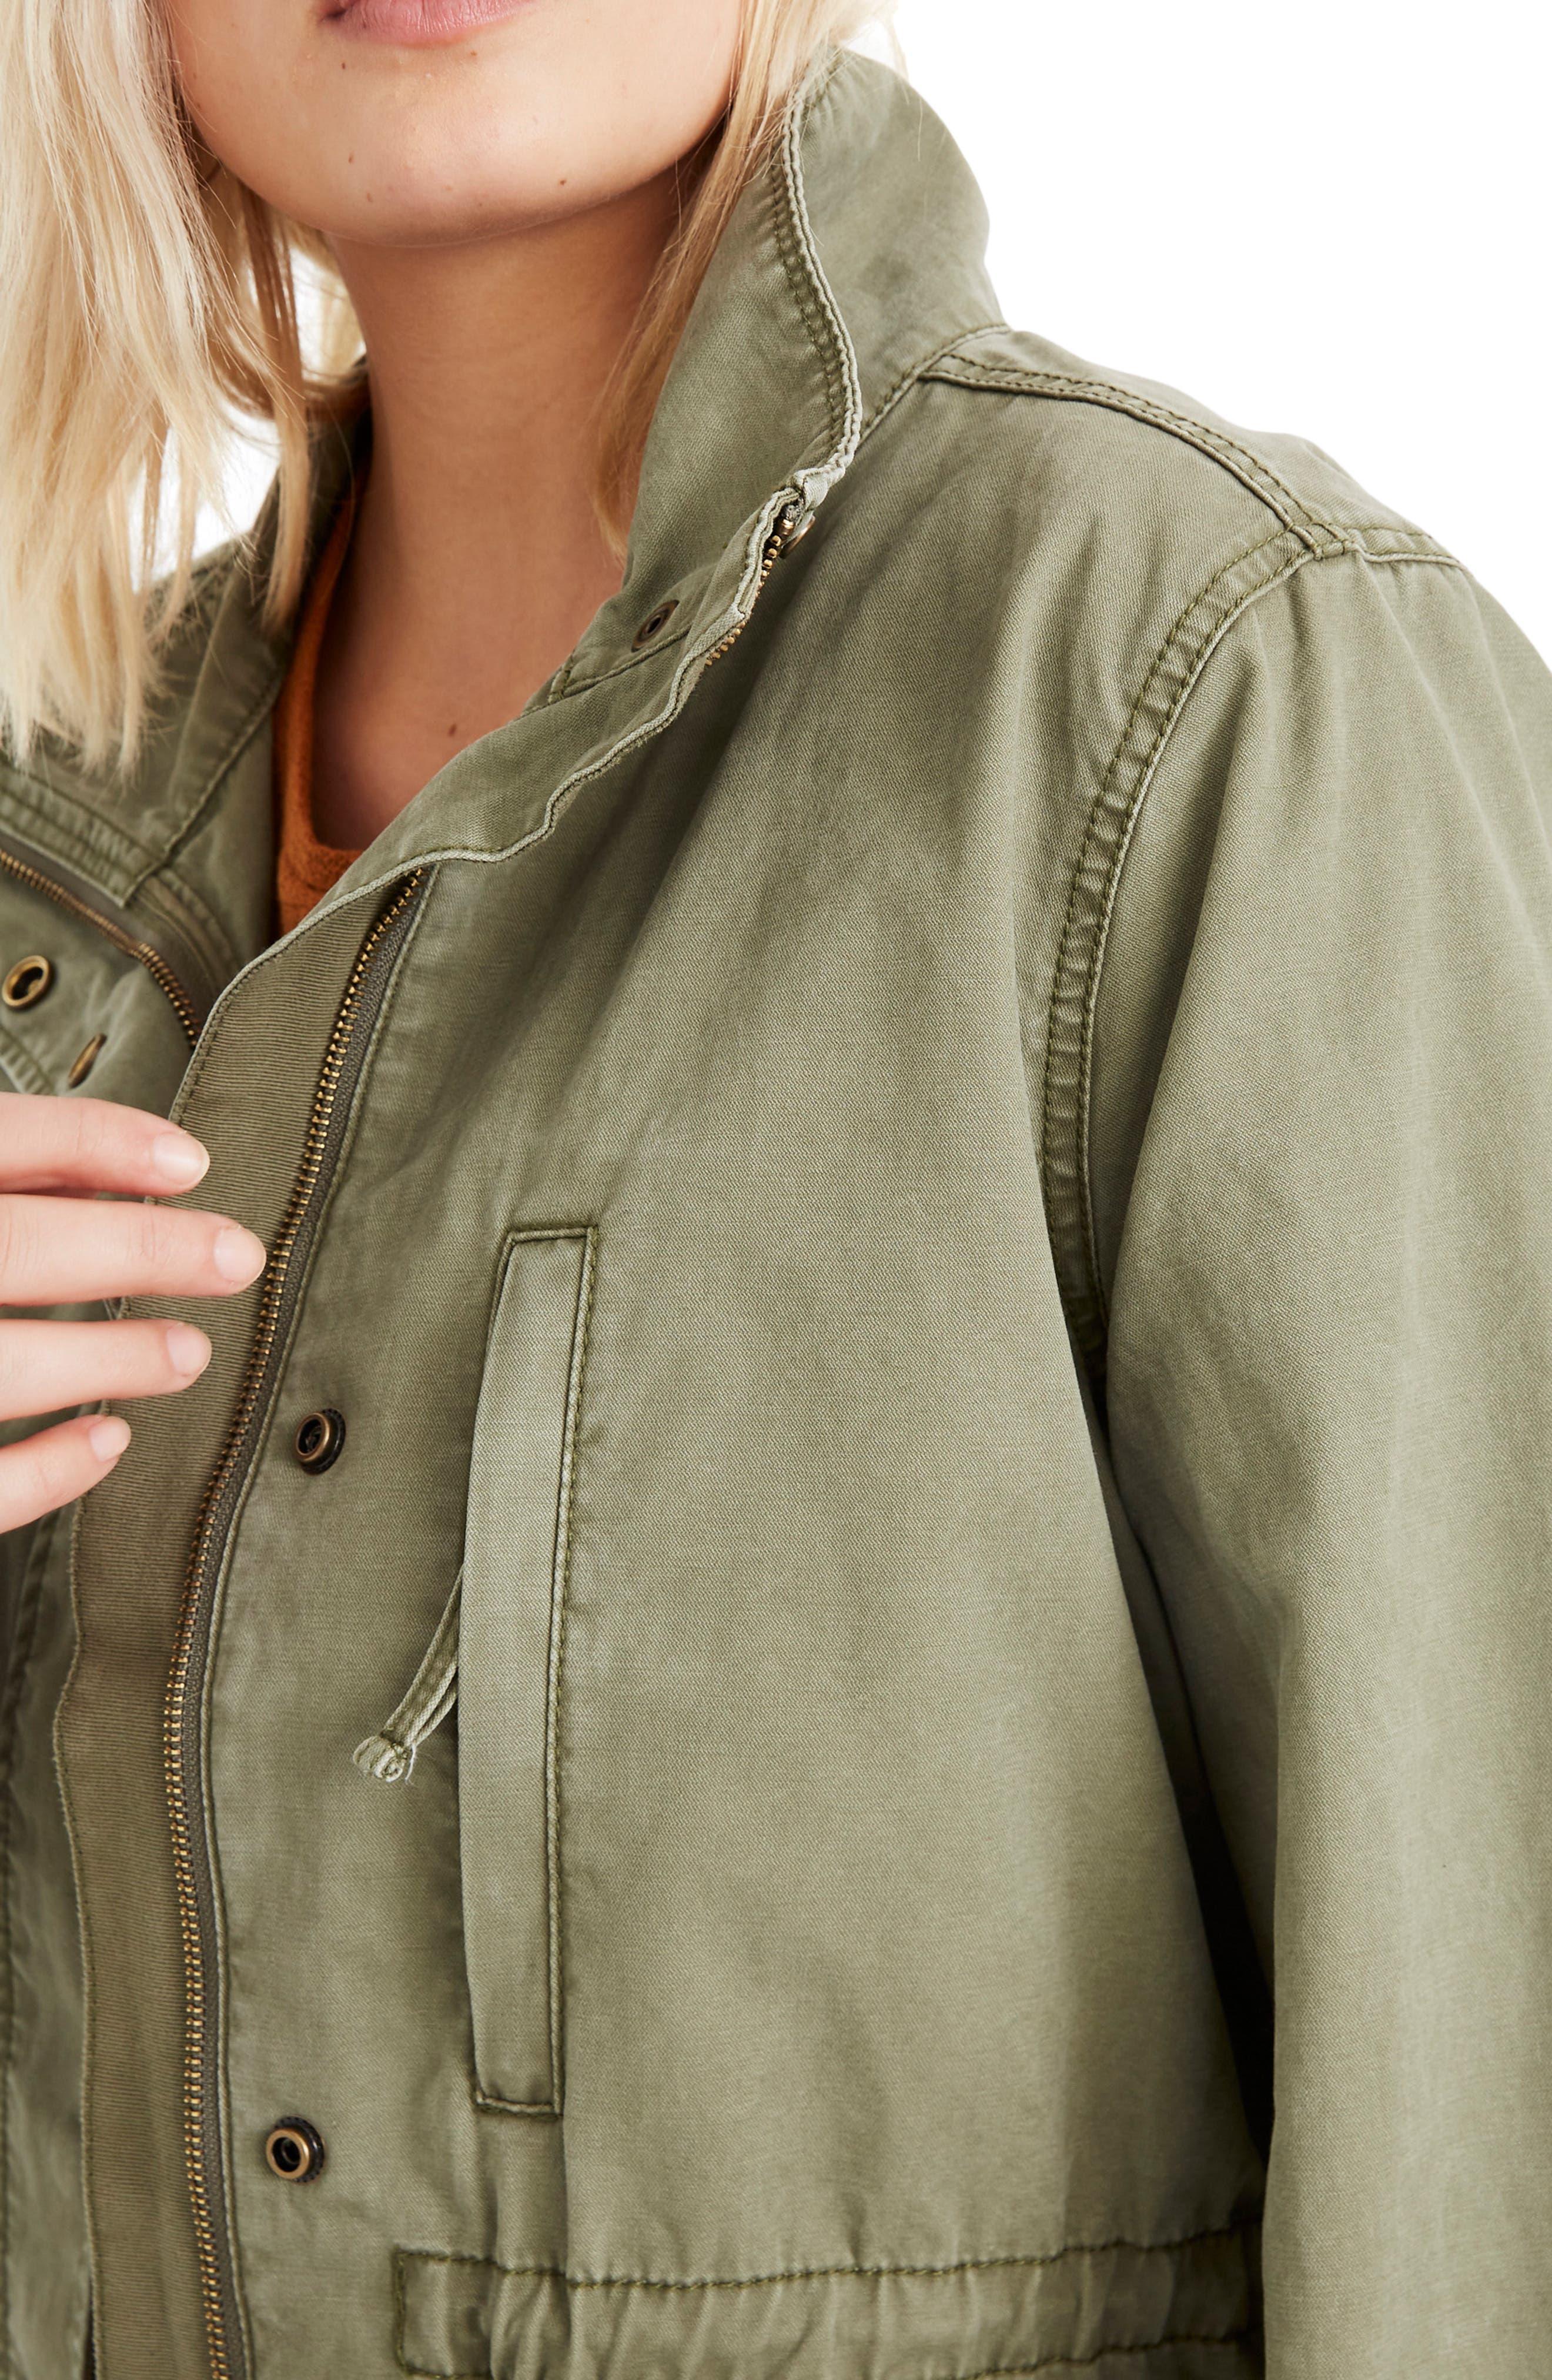 MADEWELL, Surplus Cotton Jacket, Alternate thumbnail 8, color, DESERT OLIVE